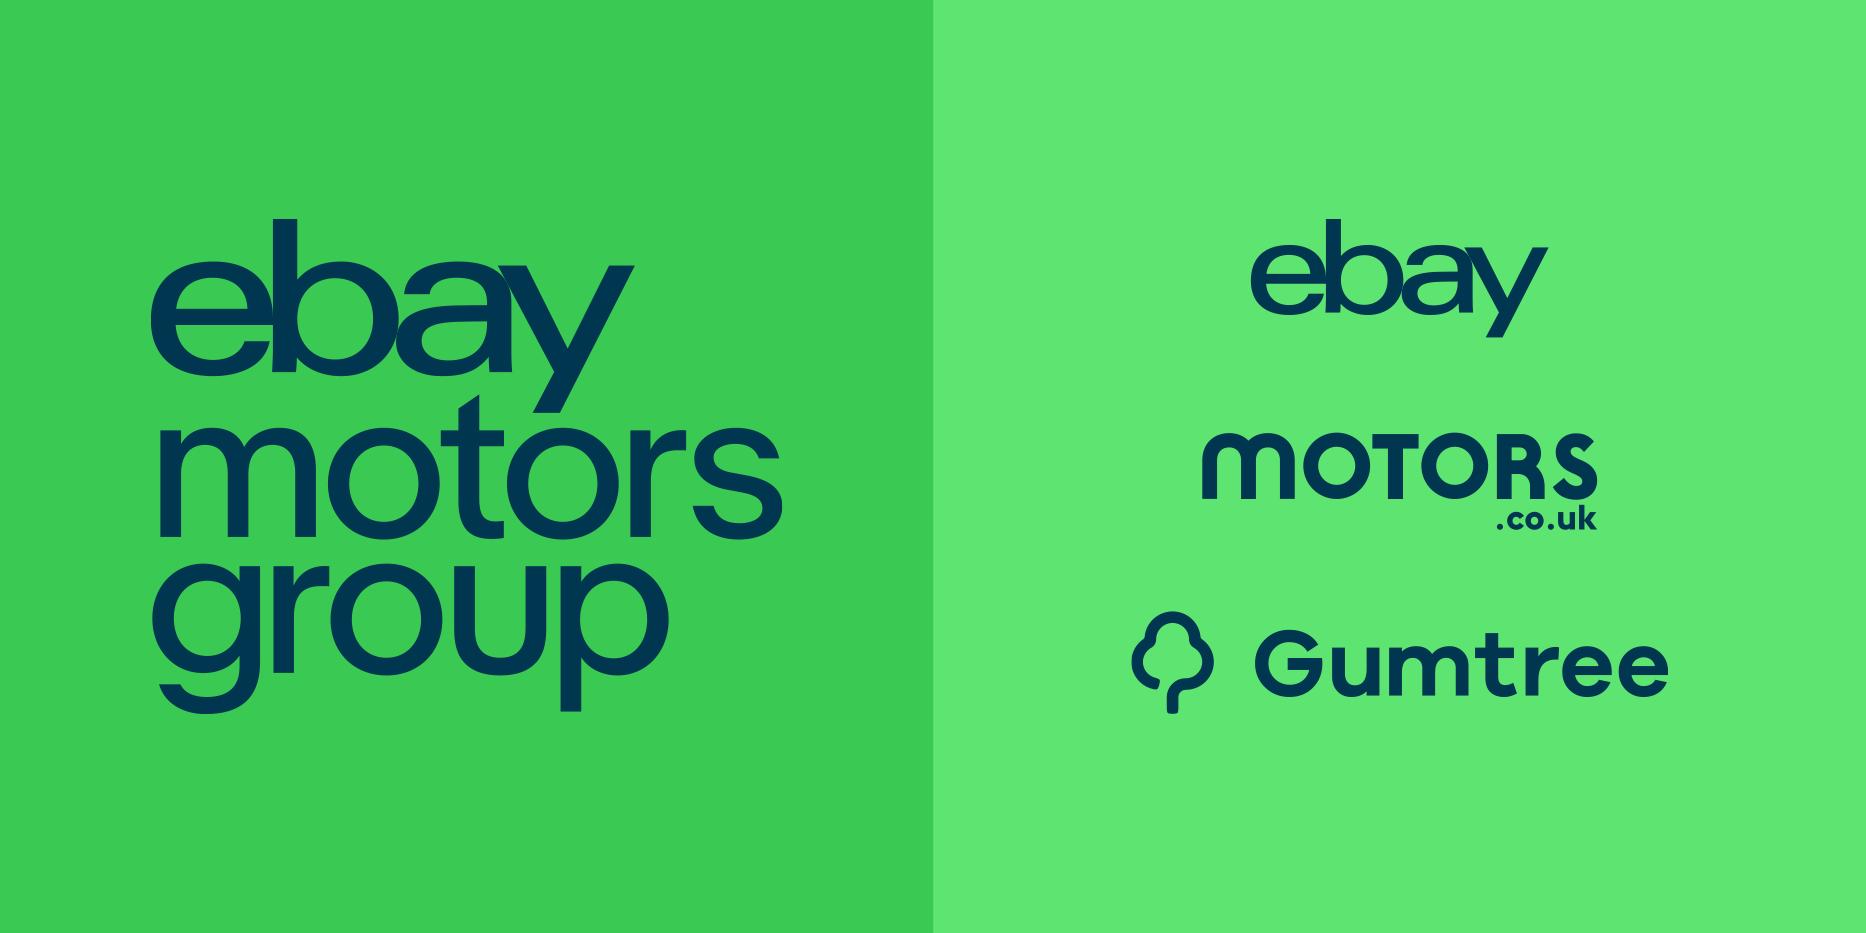 Ebay Motors Group Head Of Marketing Dermot Kelleher Joins Imperial Cars Blackshaw S Suzuki To Share 4 Top Marketing Tips On The Armchair Show Armchair Marketing Digital Marketing Automotive Advertising Tools